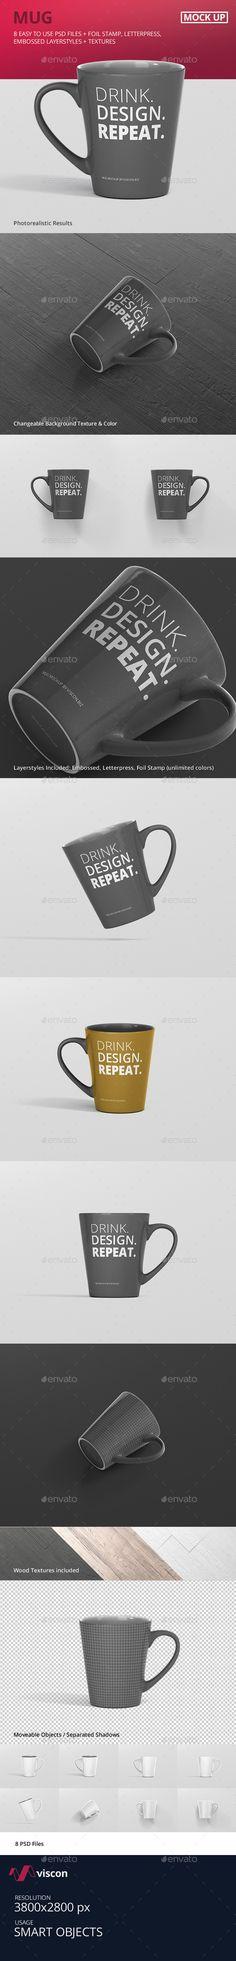 Mug Mockup  Cone — Photoshop PSD #presentation #tea • Available here → https://graphicriver.net/item/mug-mockup-cone/19276303?ref=pxcr